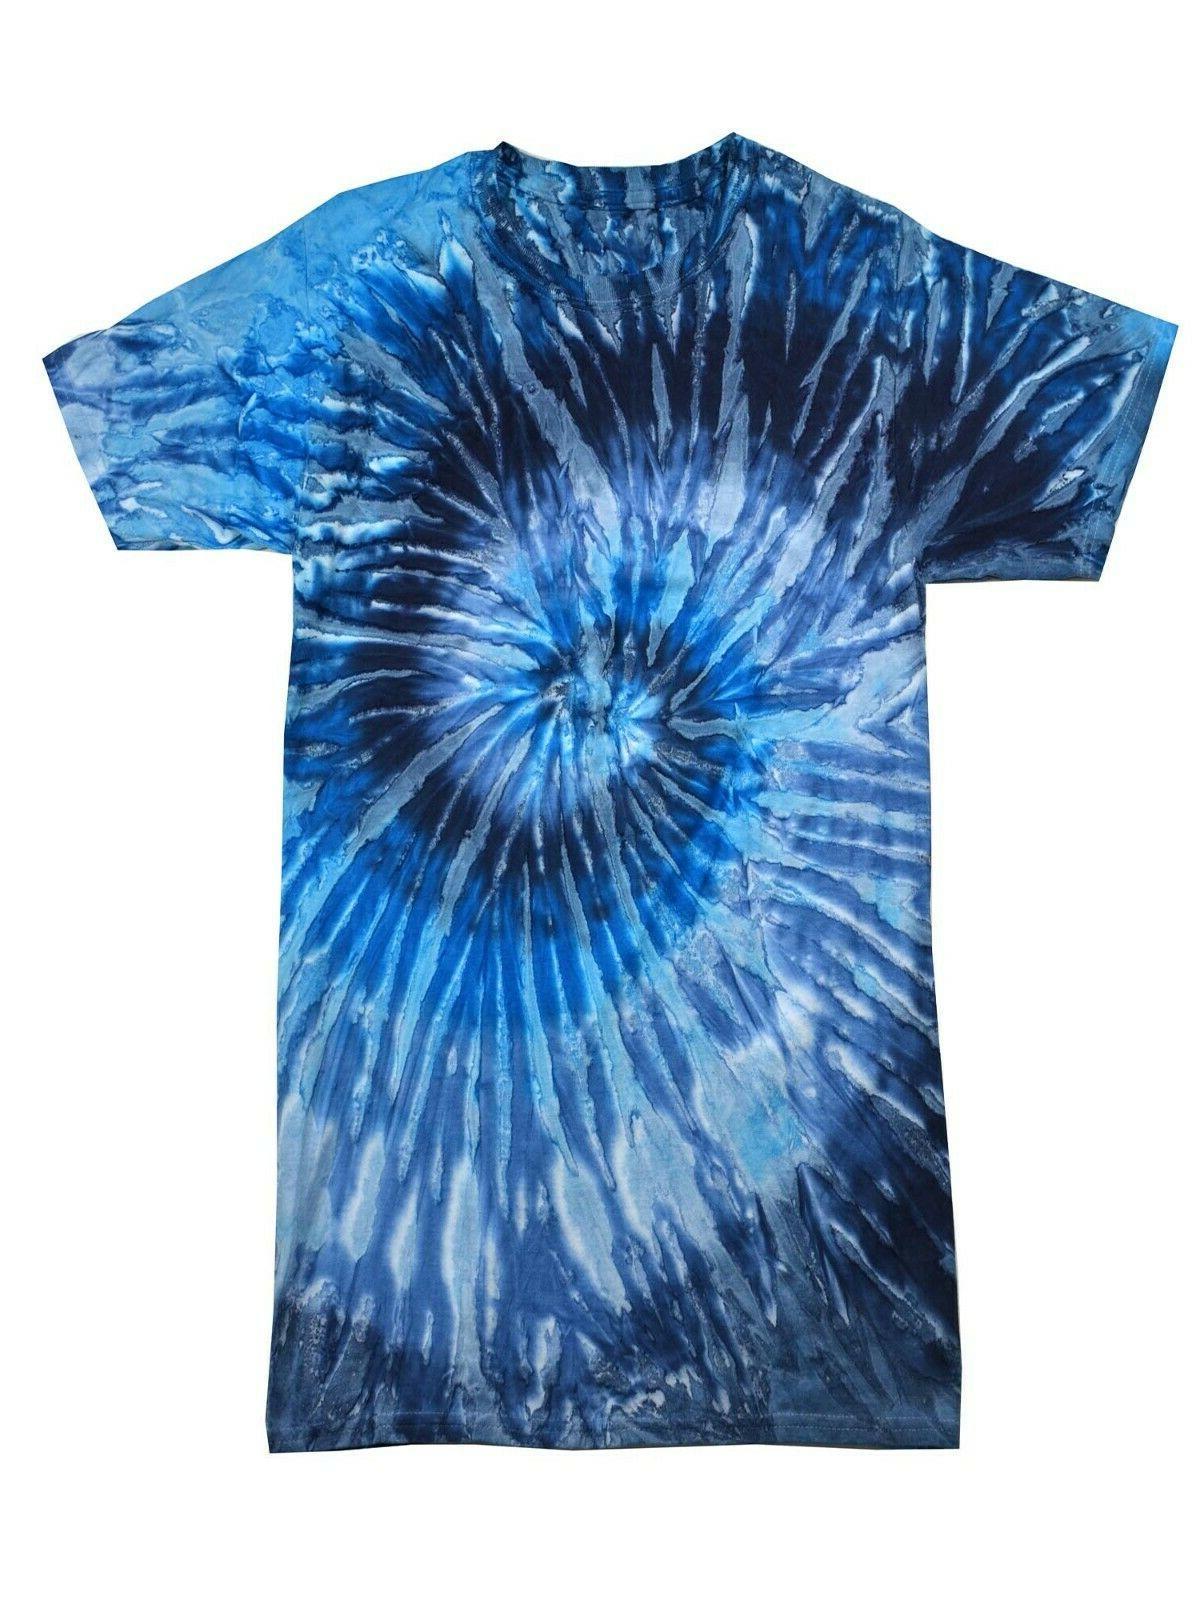 Multi-Color Tie Dye Adult M XL 3XL 5XL, 100%